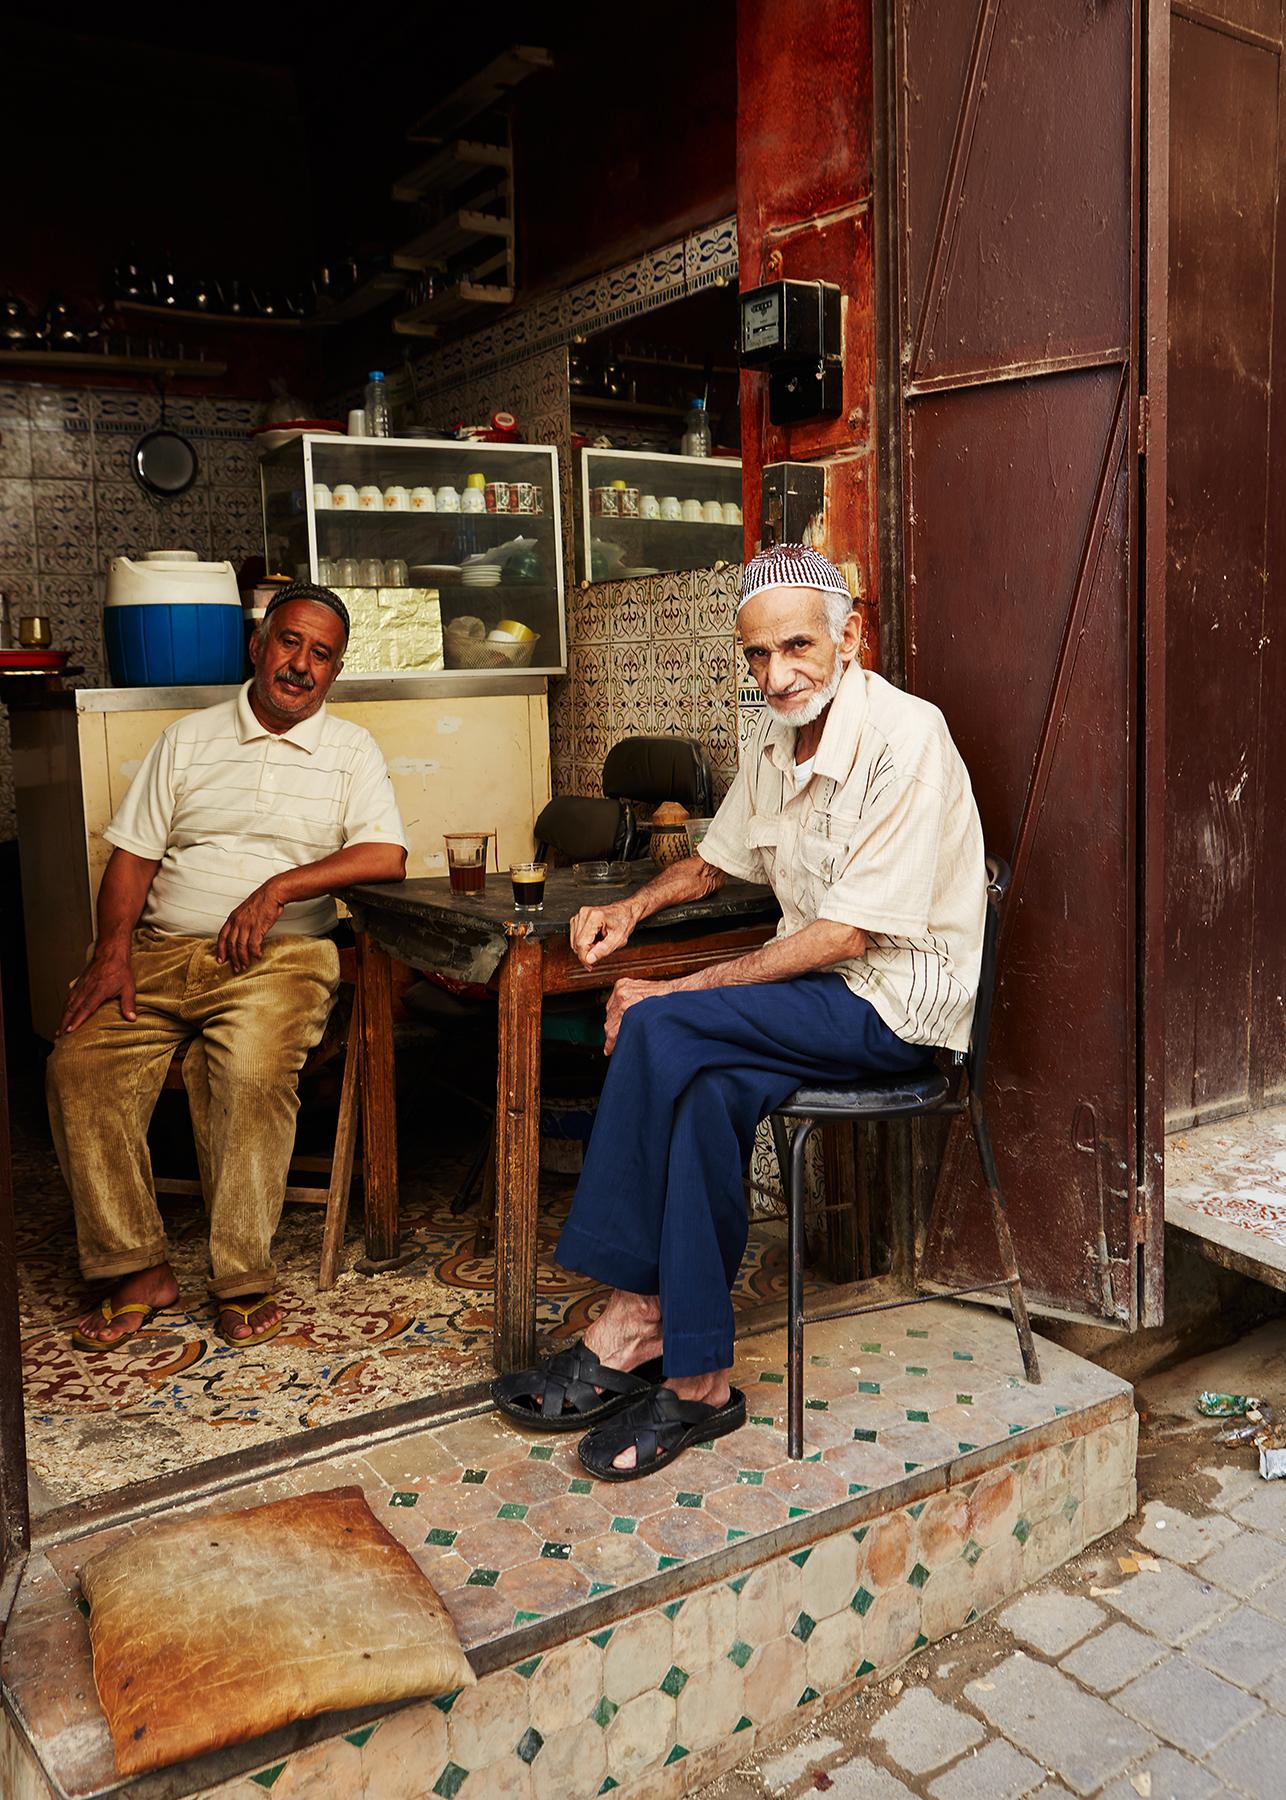 Anna_McKerrow_Morocco_19.jpg